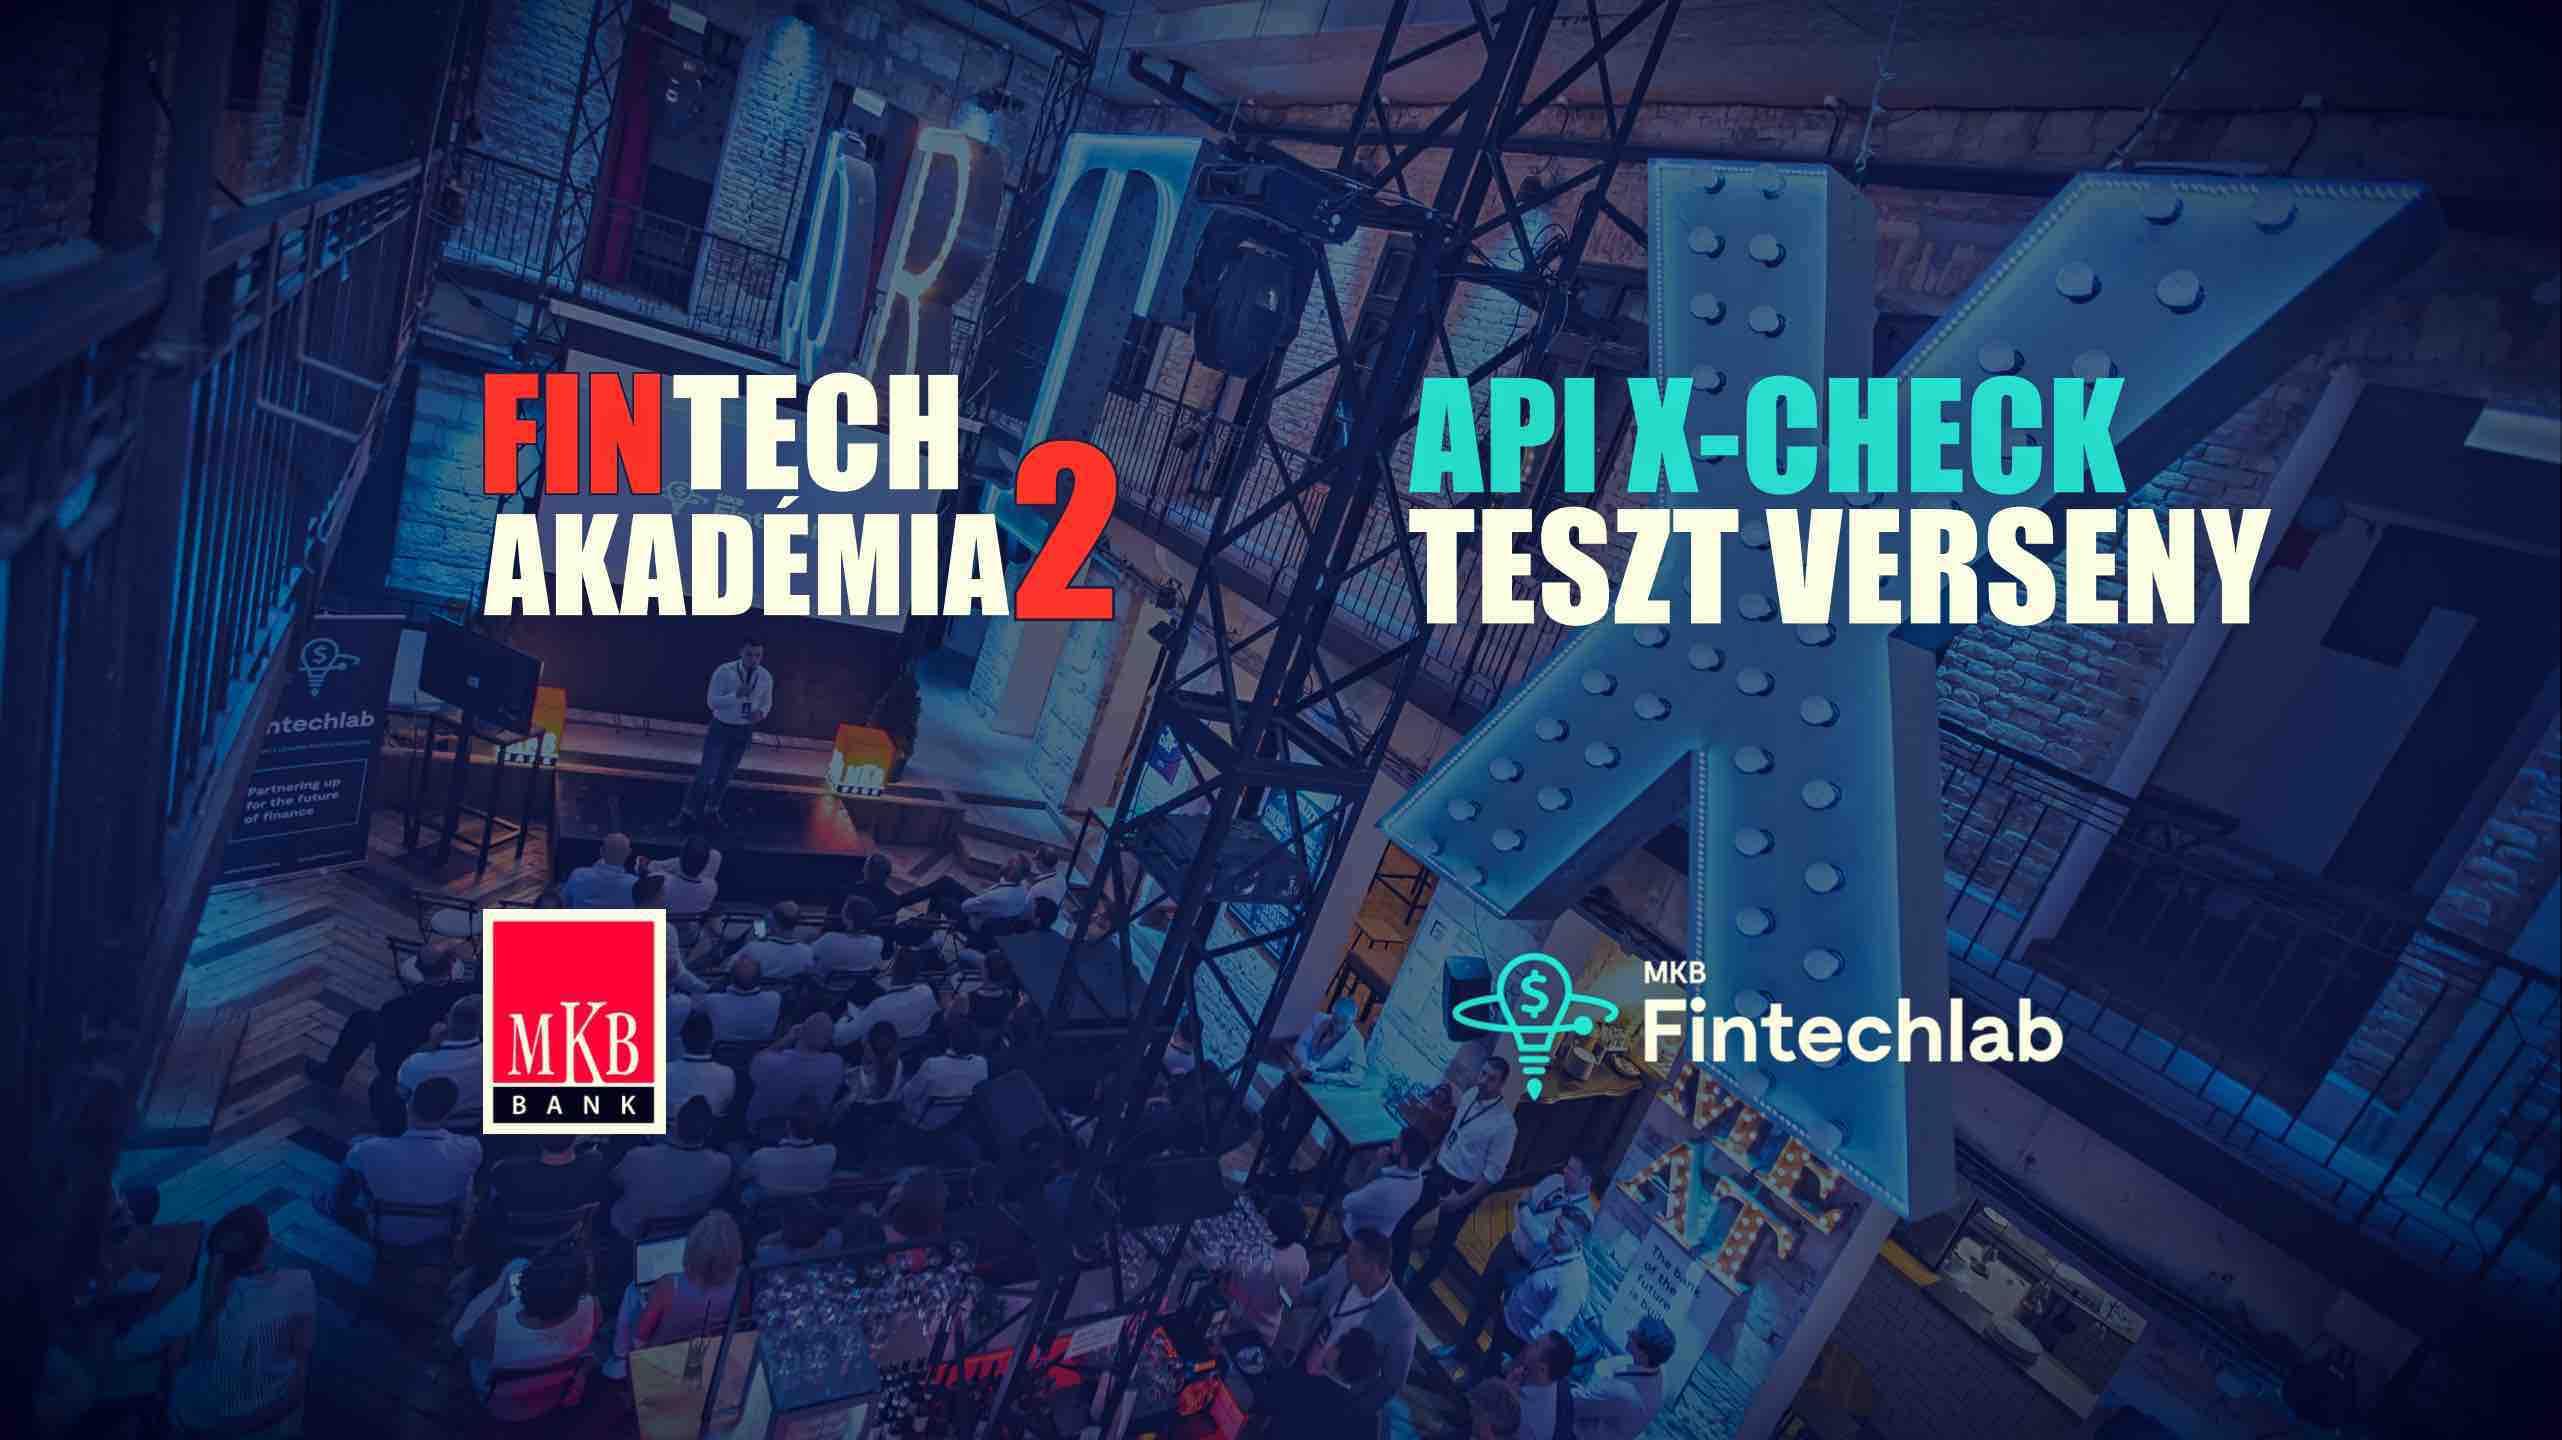 Fintech Akademia 2 API X-CHECK teszt verseny fintechlab